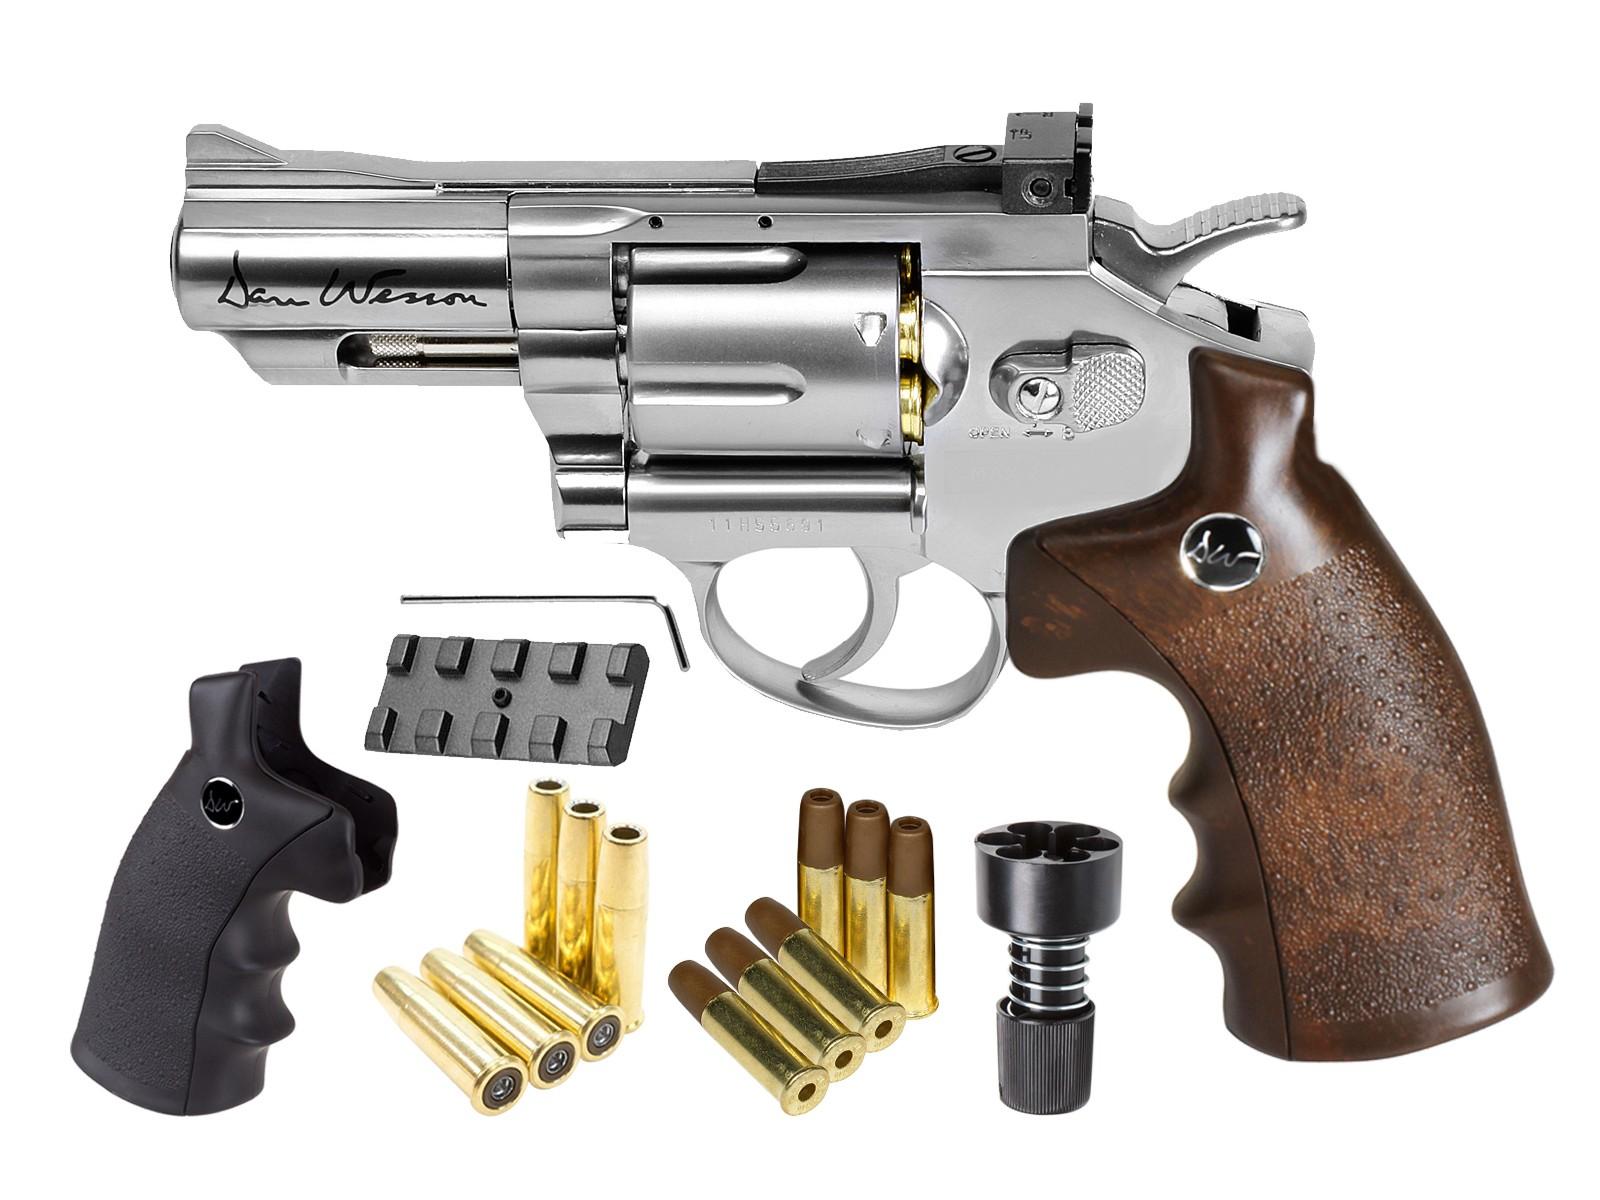 "Dan Wesson CO2 BB Dual Ammo, Dual Grip Revolver Kit, 2.5"" 0.177 Image"